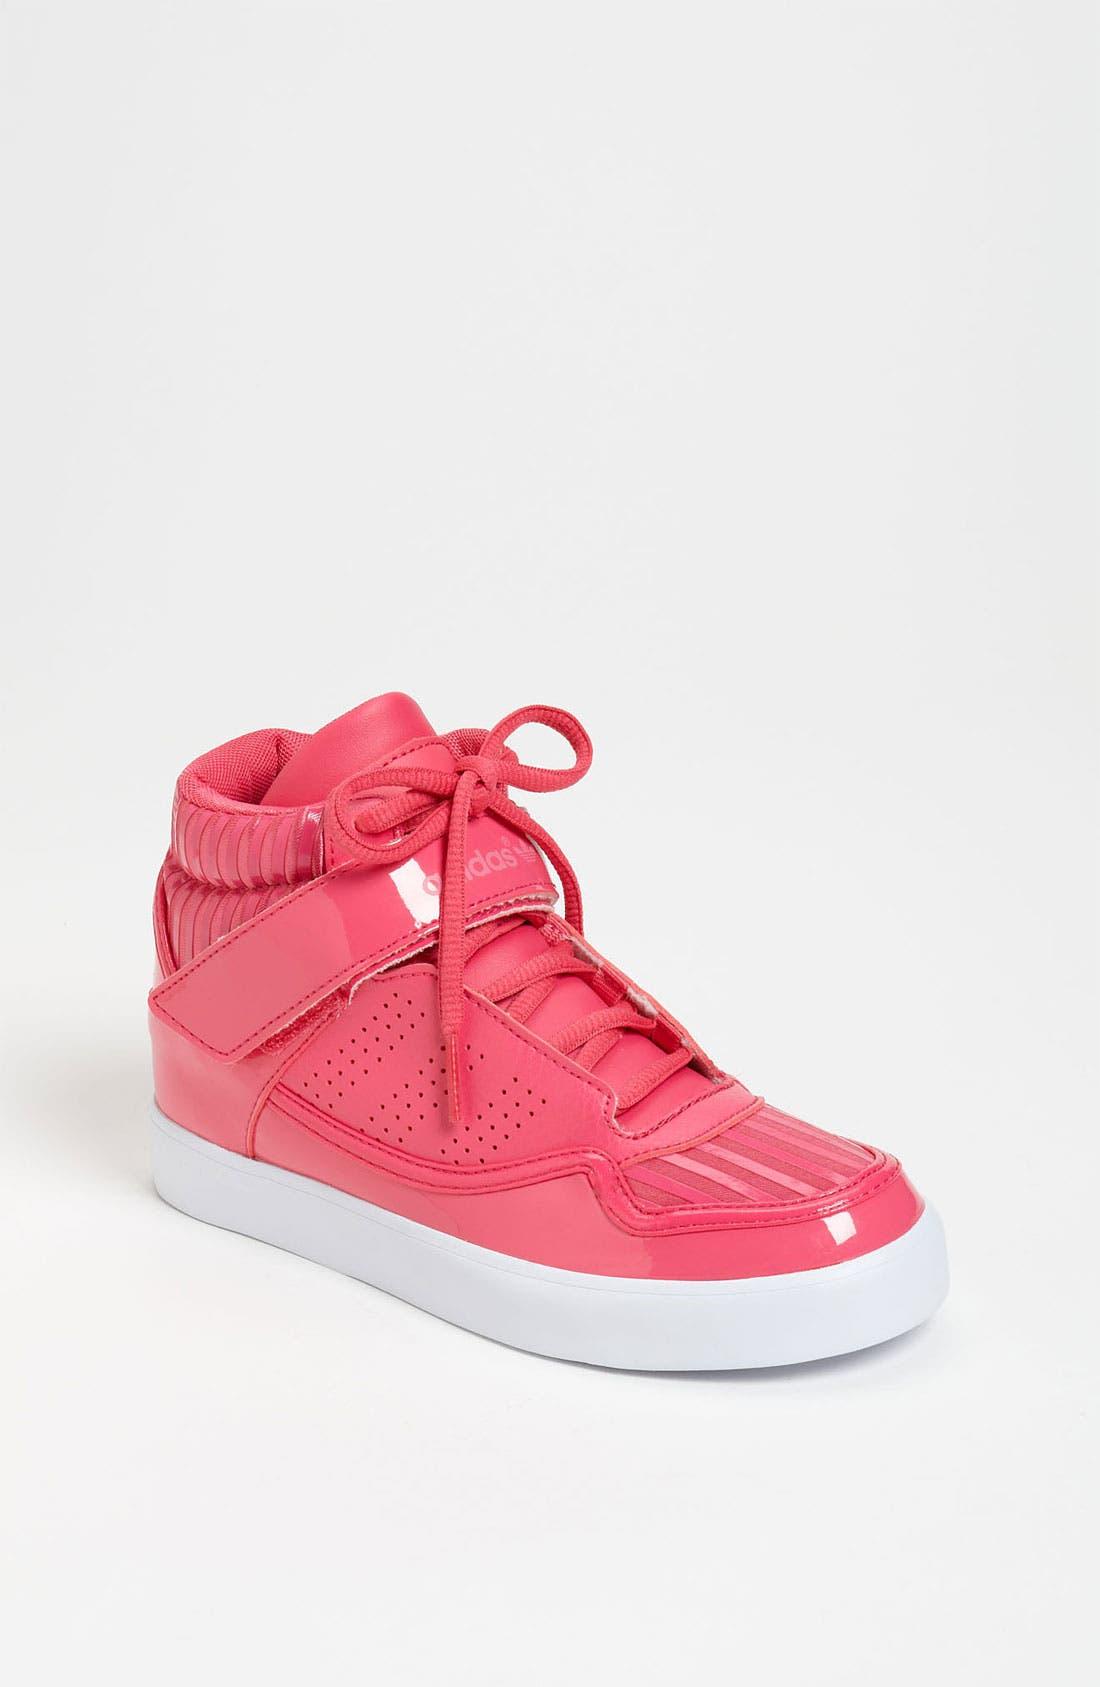 Alternate Image 1 Selected - adidas 'AR 2.0' Sneaker (Toddler & Little Kid)